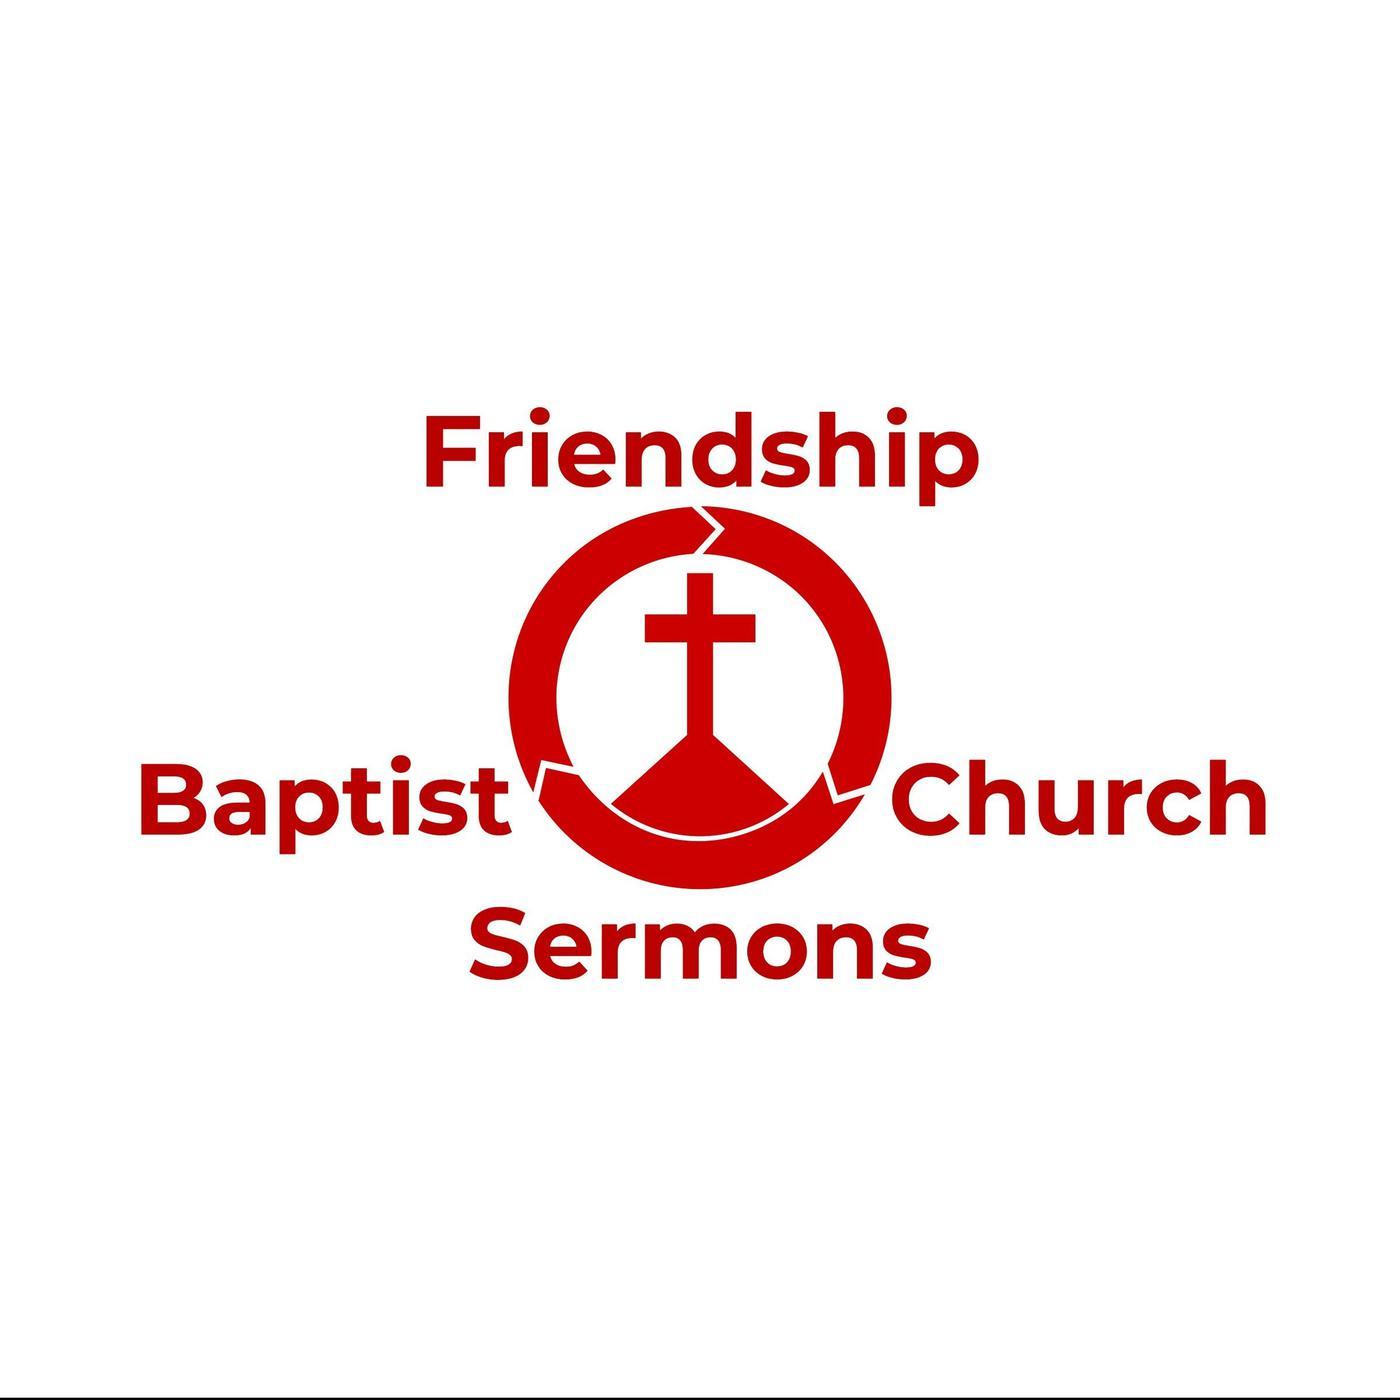 God's Creation of Everything (Genesis 1:1-25) - Friendship Baptist